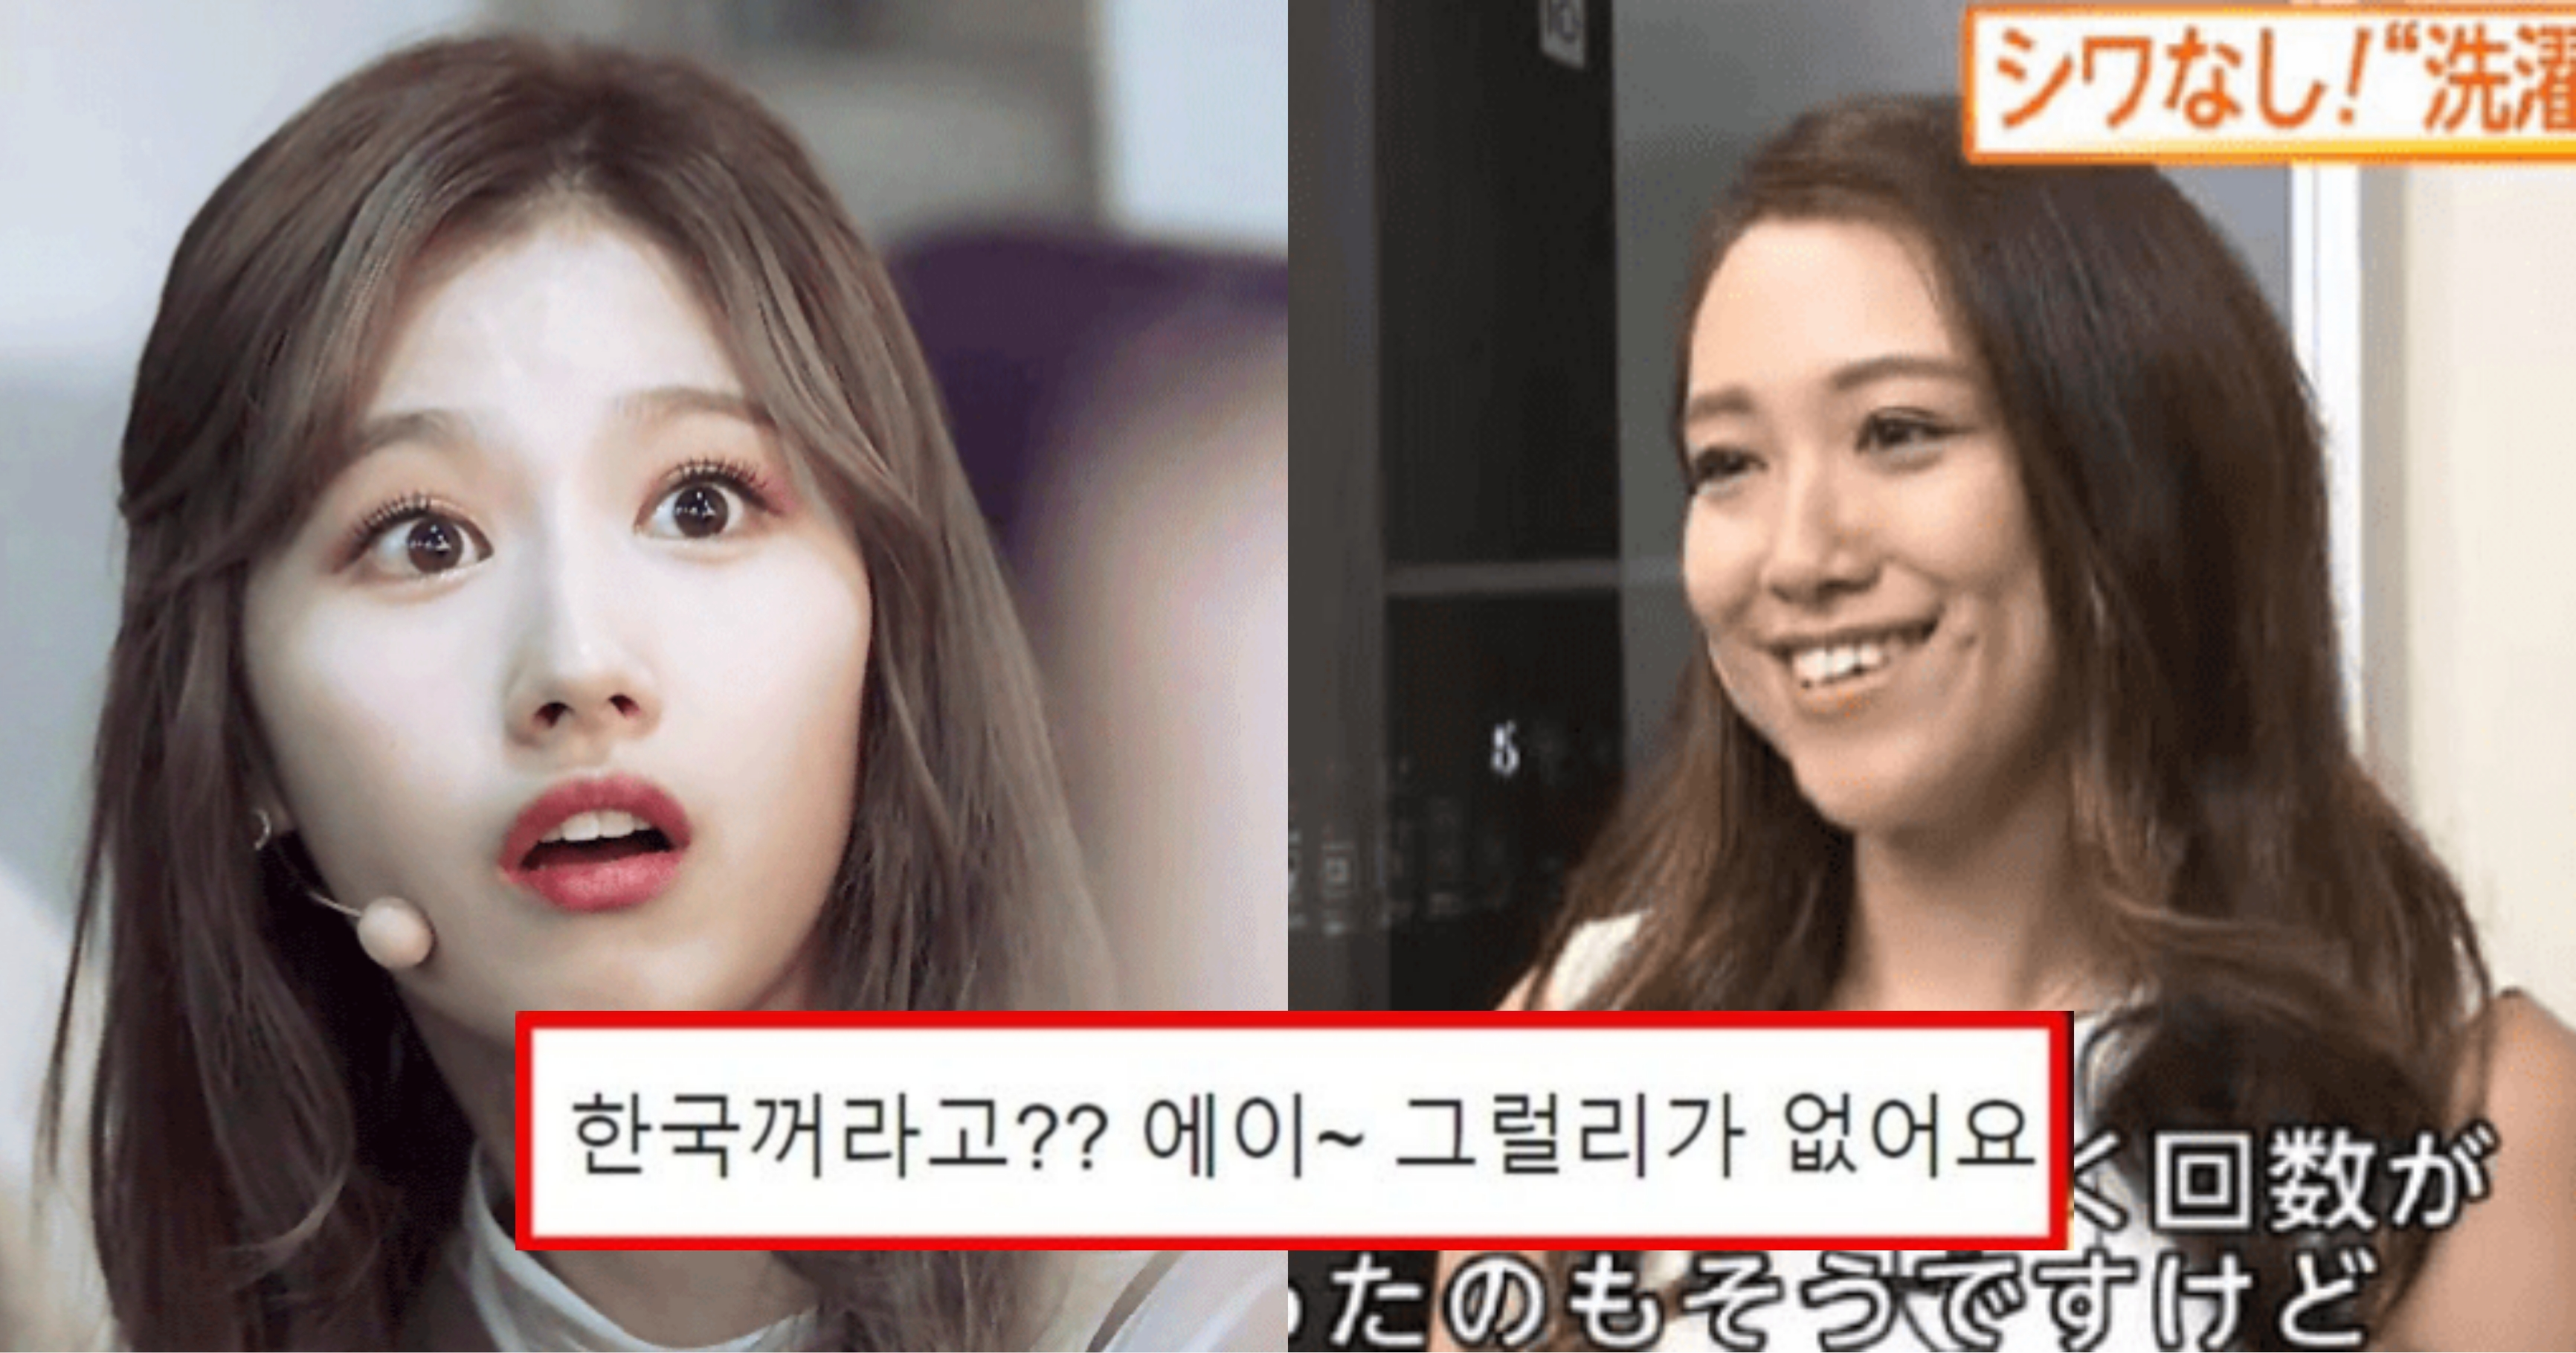 "kakaotalk 20210920 213208861.jpg - ""한국꺼였어?"" 한국산인줄 몰랐다는 일본인들에게 엄청난 인기를 끌고 있는 한국 제품"